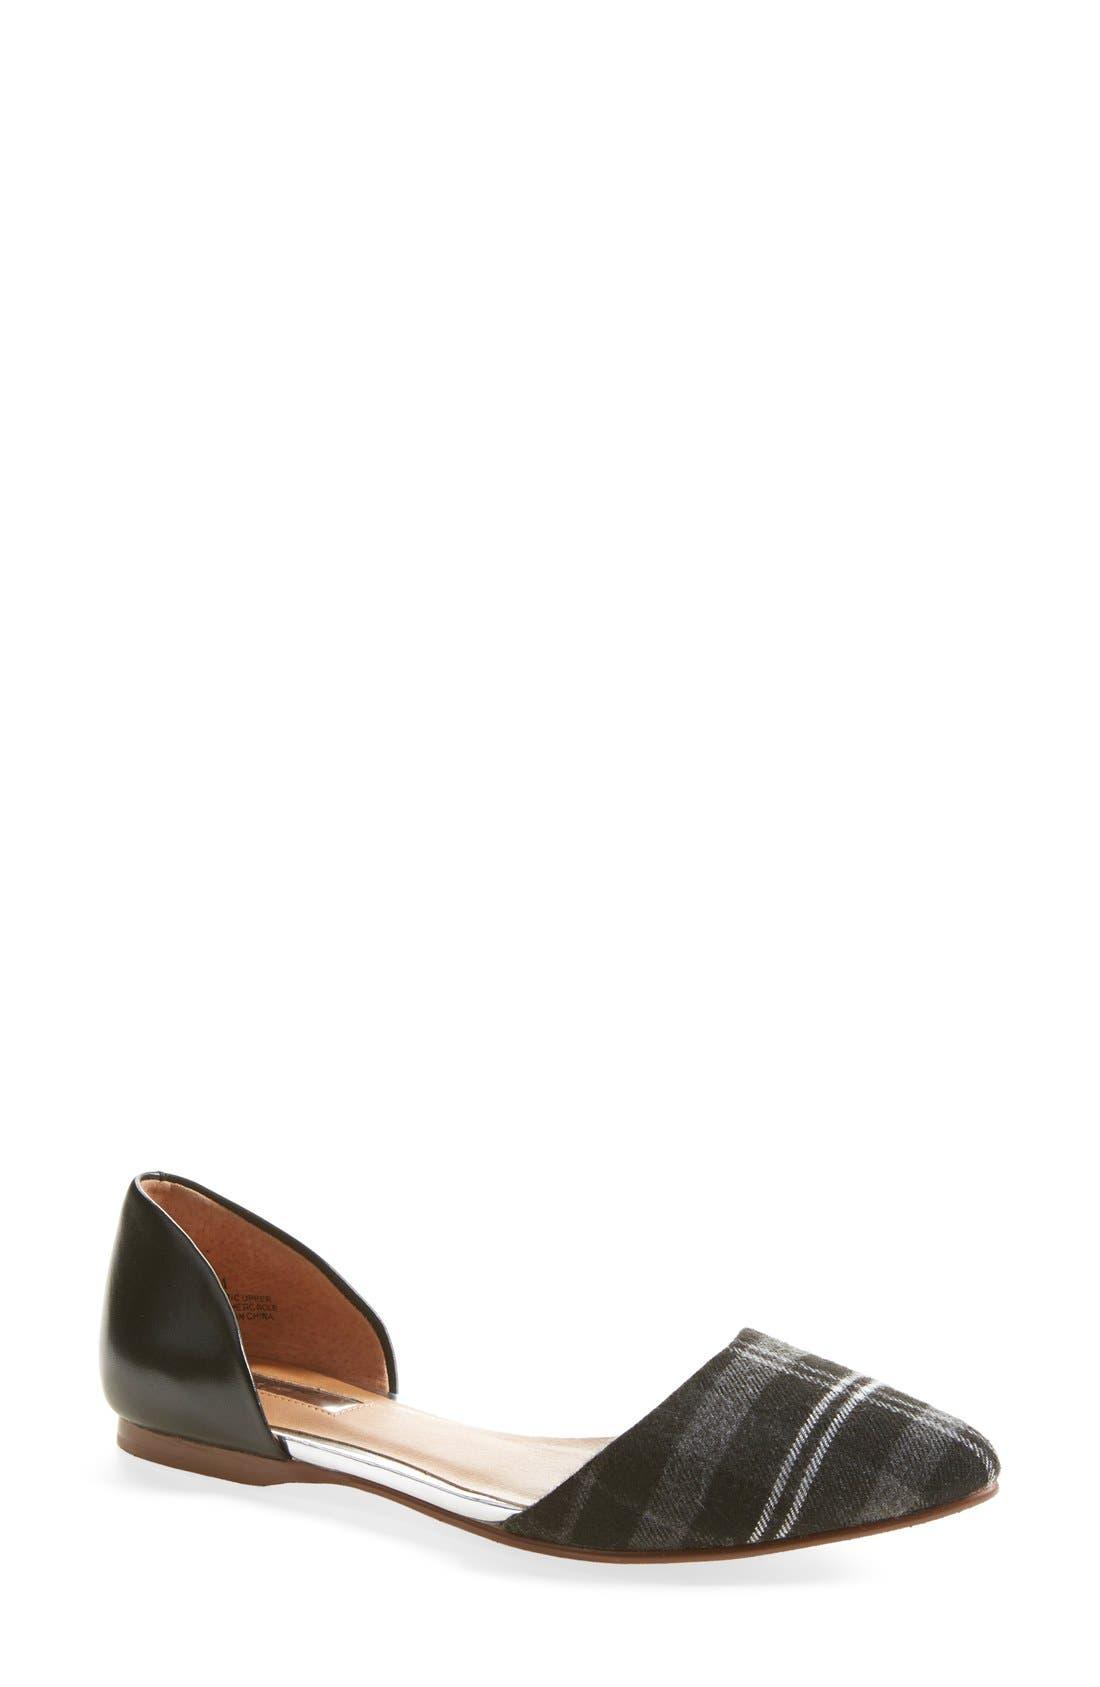 Main Image - Halogen® 'Kayla' d'Orsay Flat